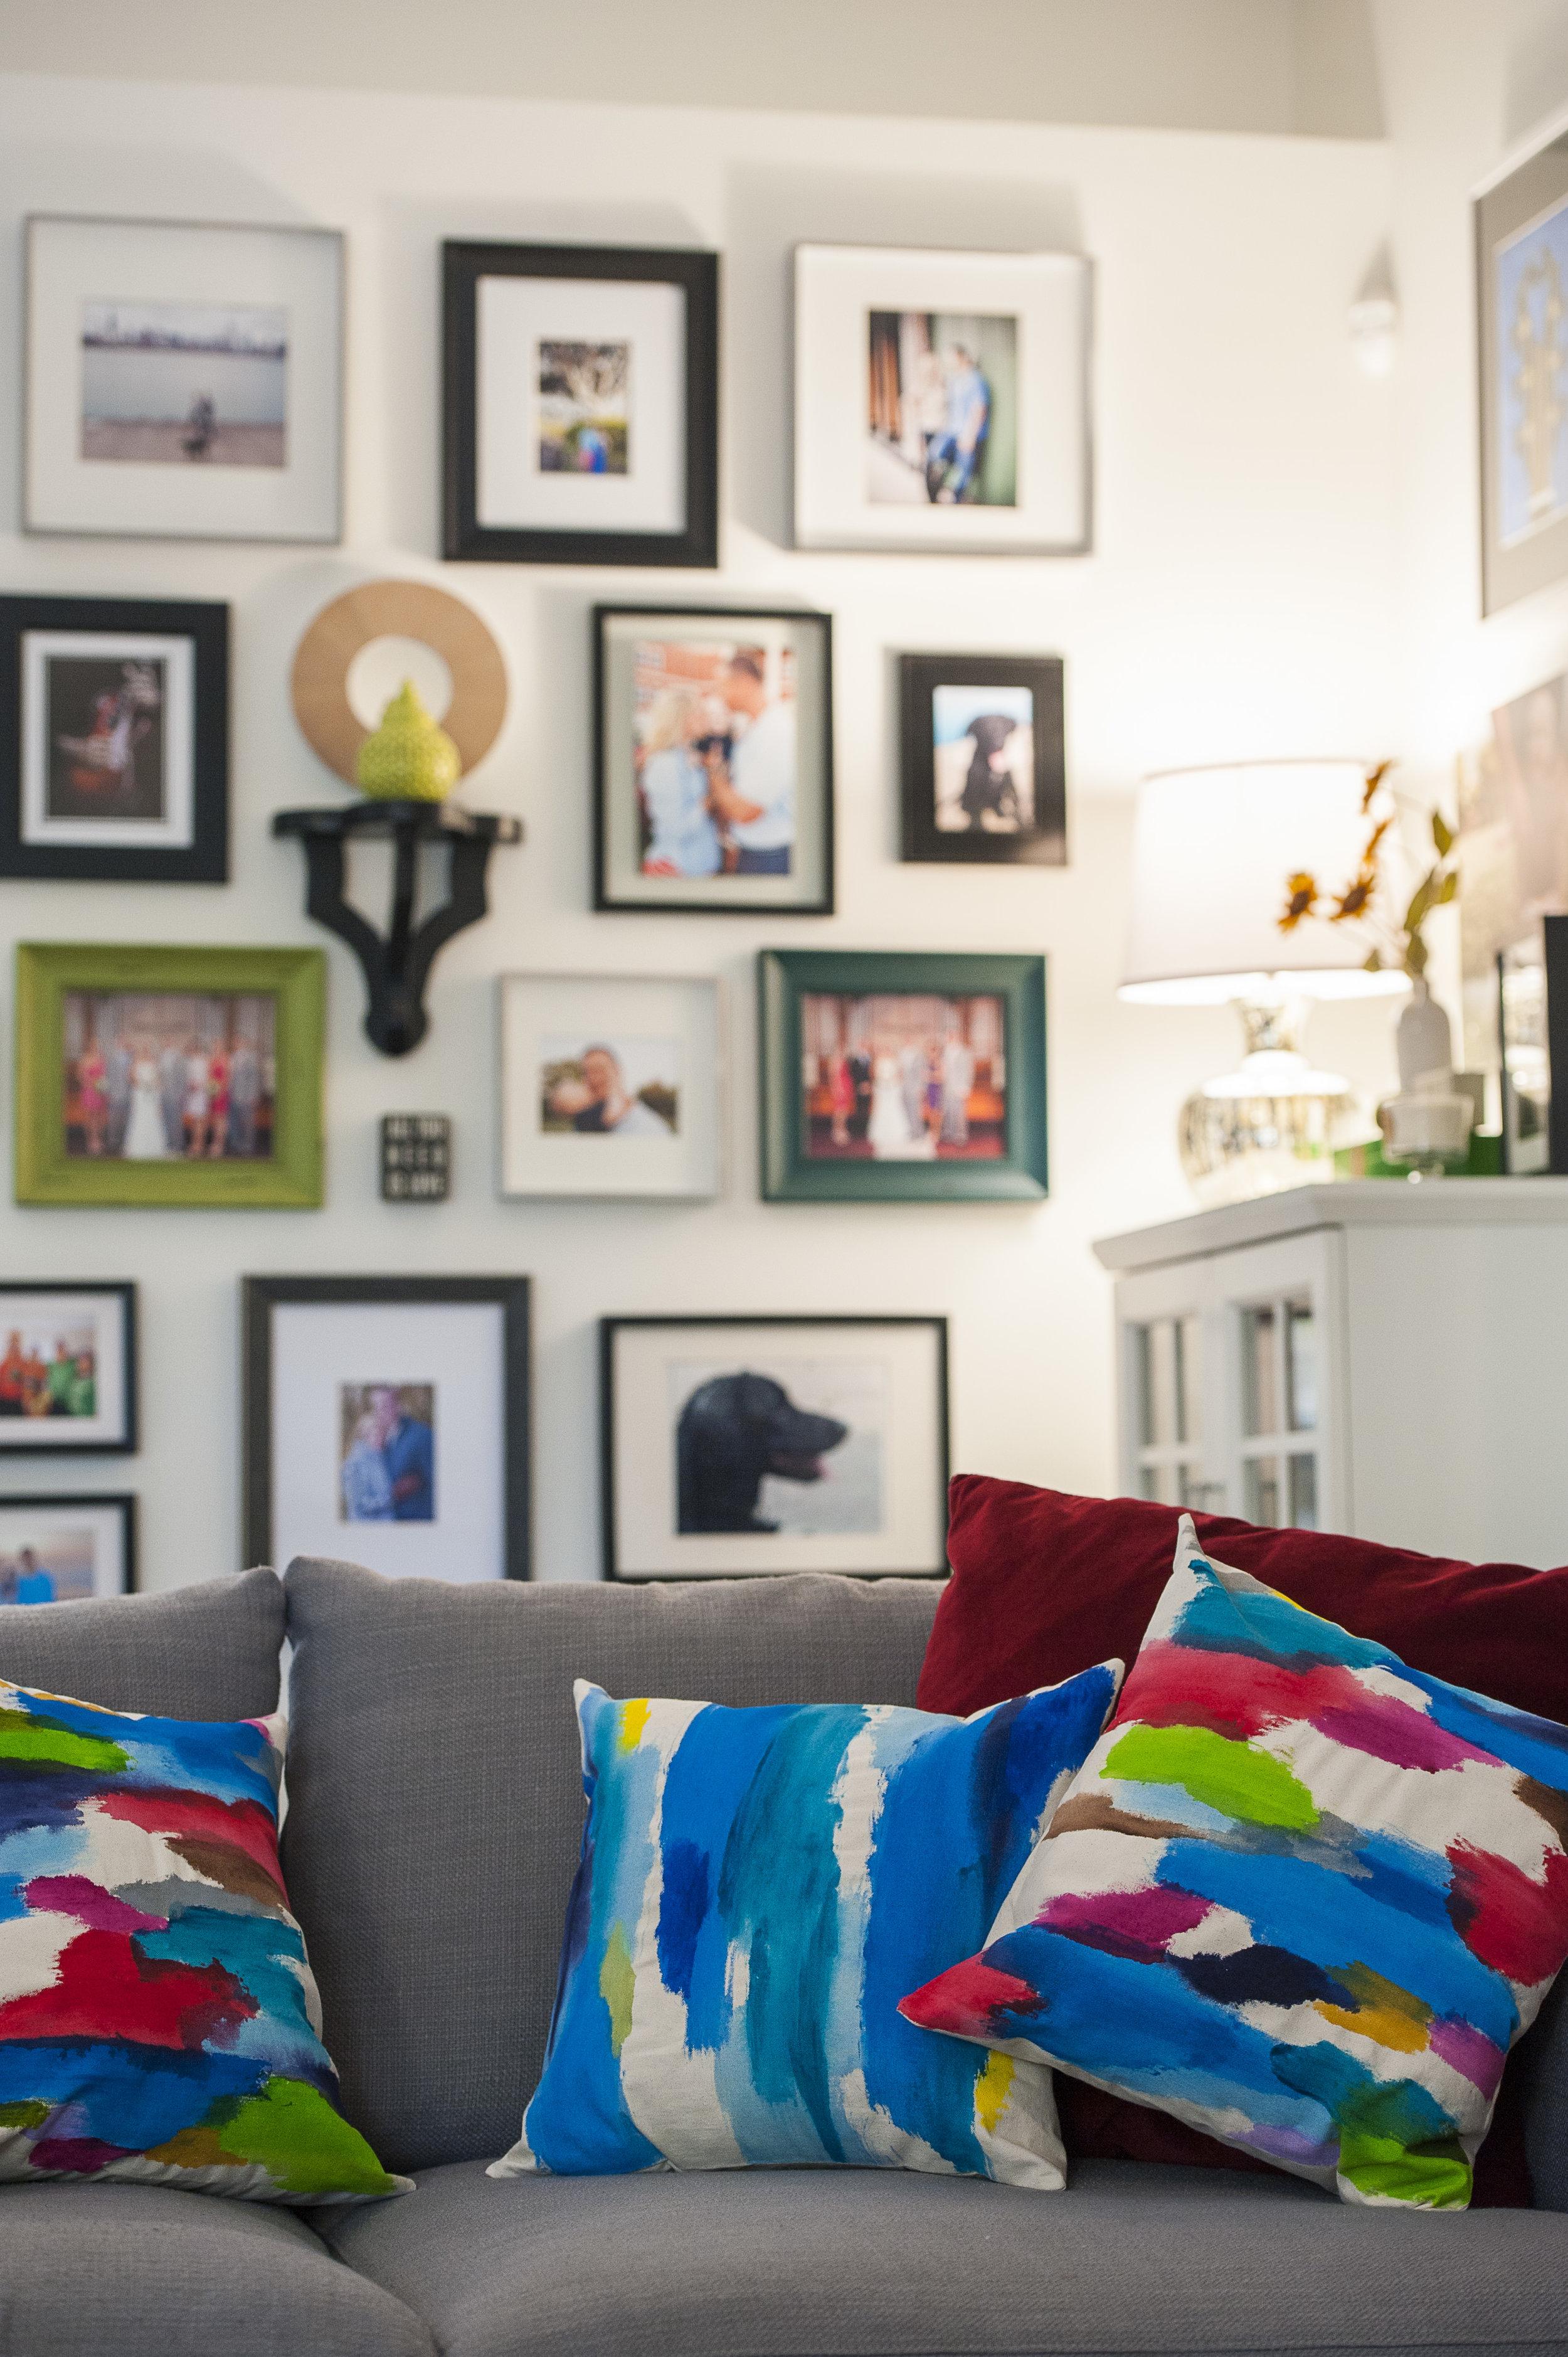 julie_kay_designs_geoffsphotos_04.jpg